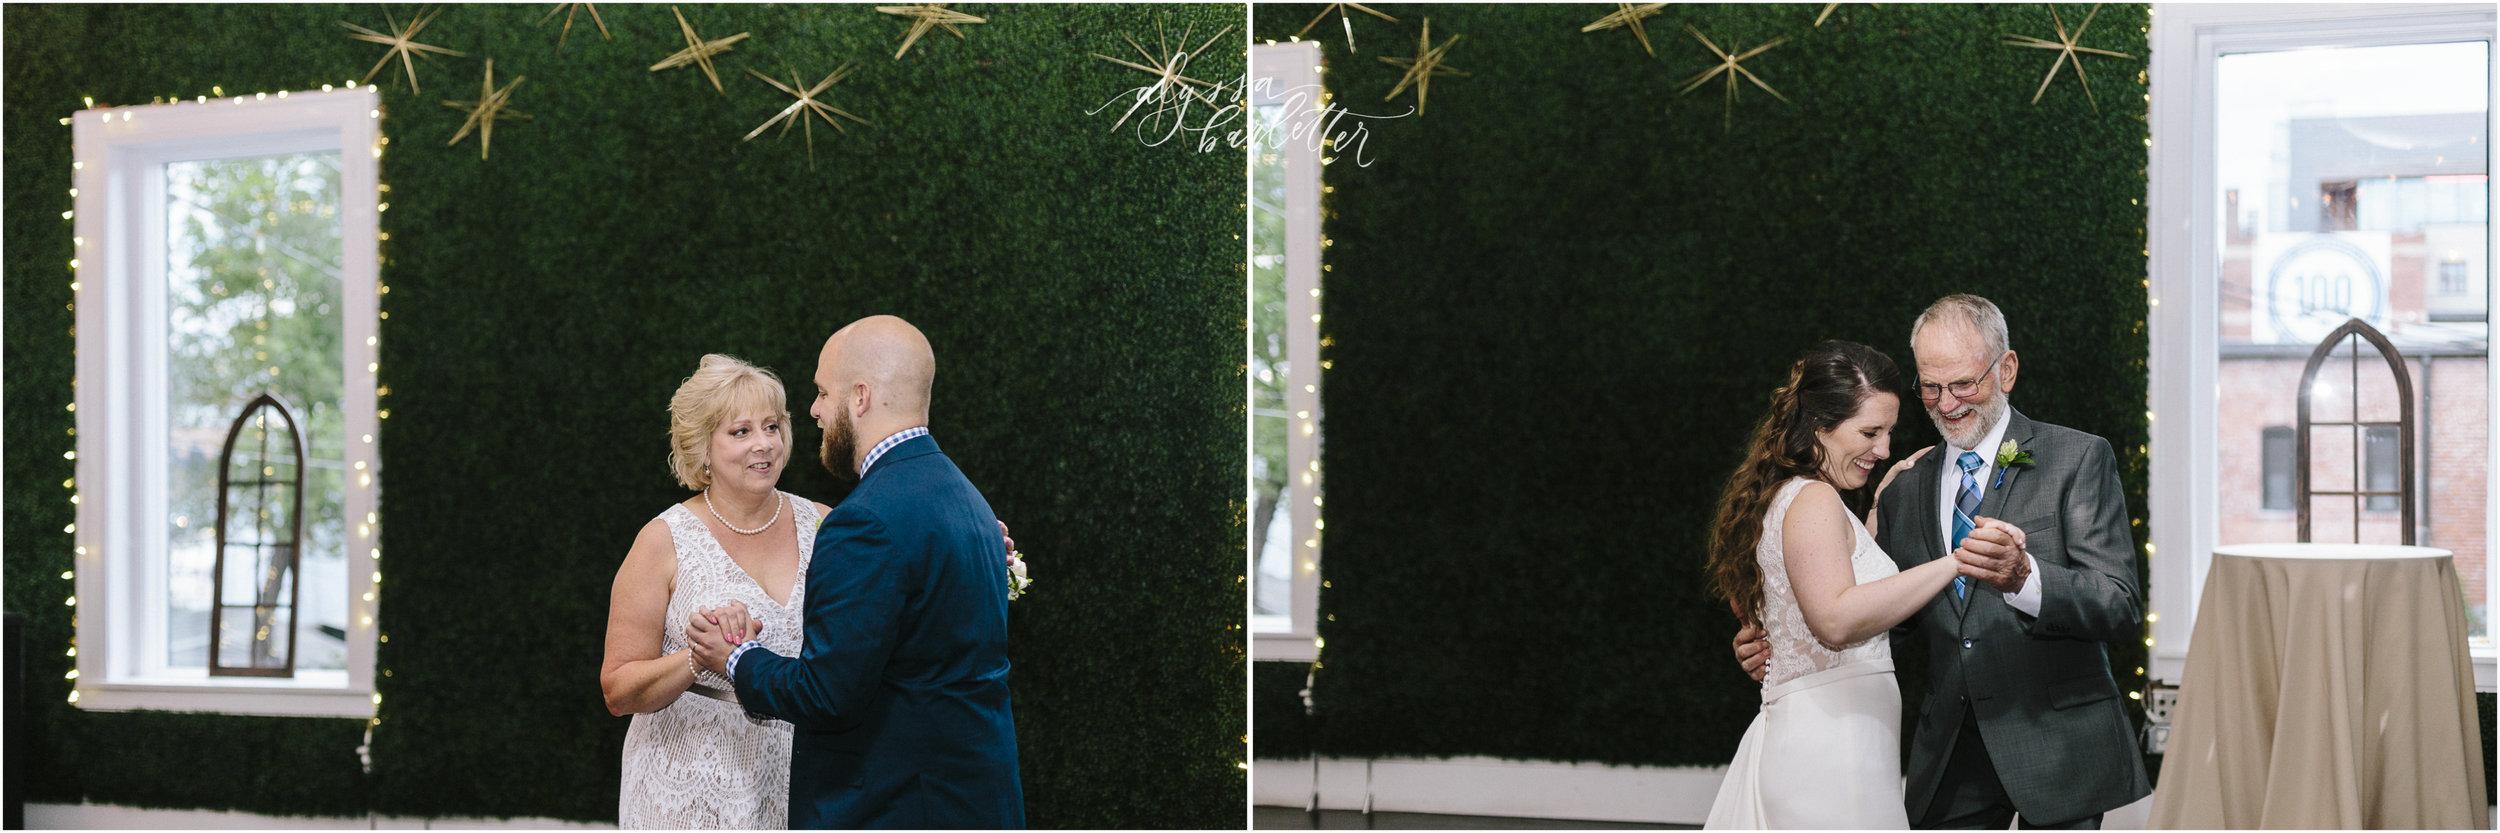 alyssa barletter photography kansas city wedding 2016 main courtney and brian-1-50.jpg